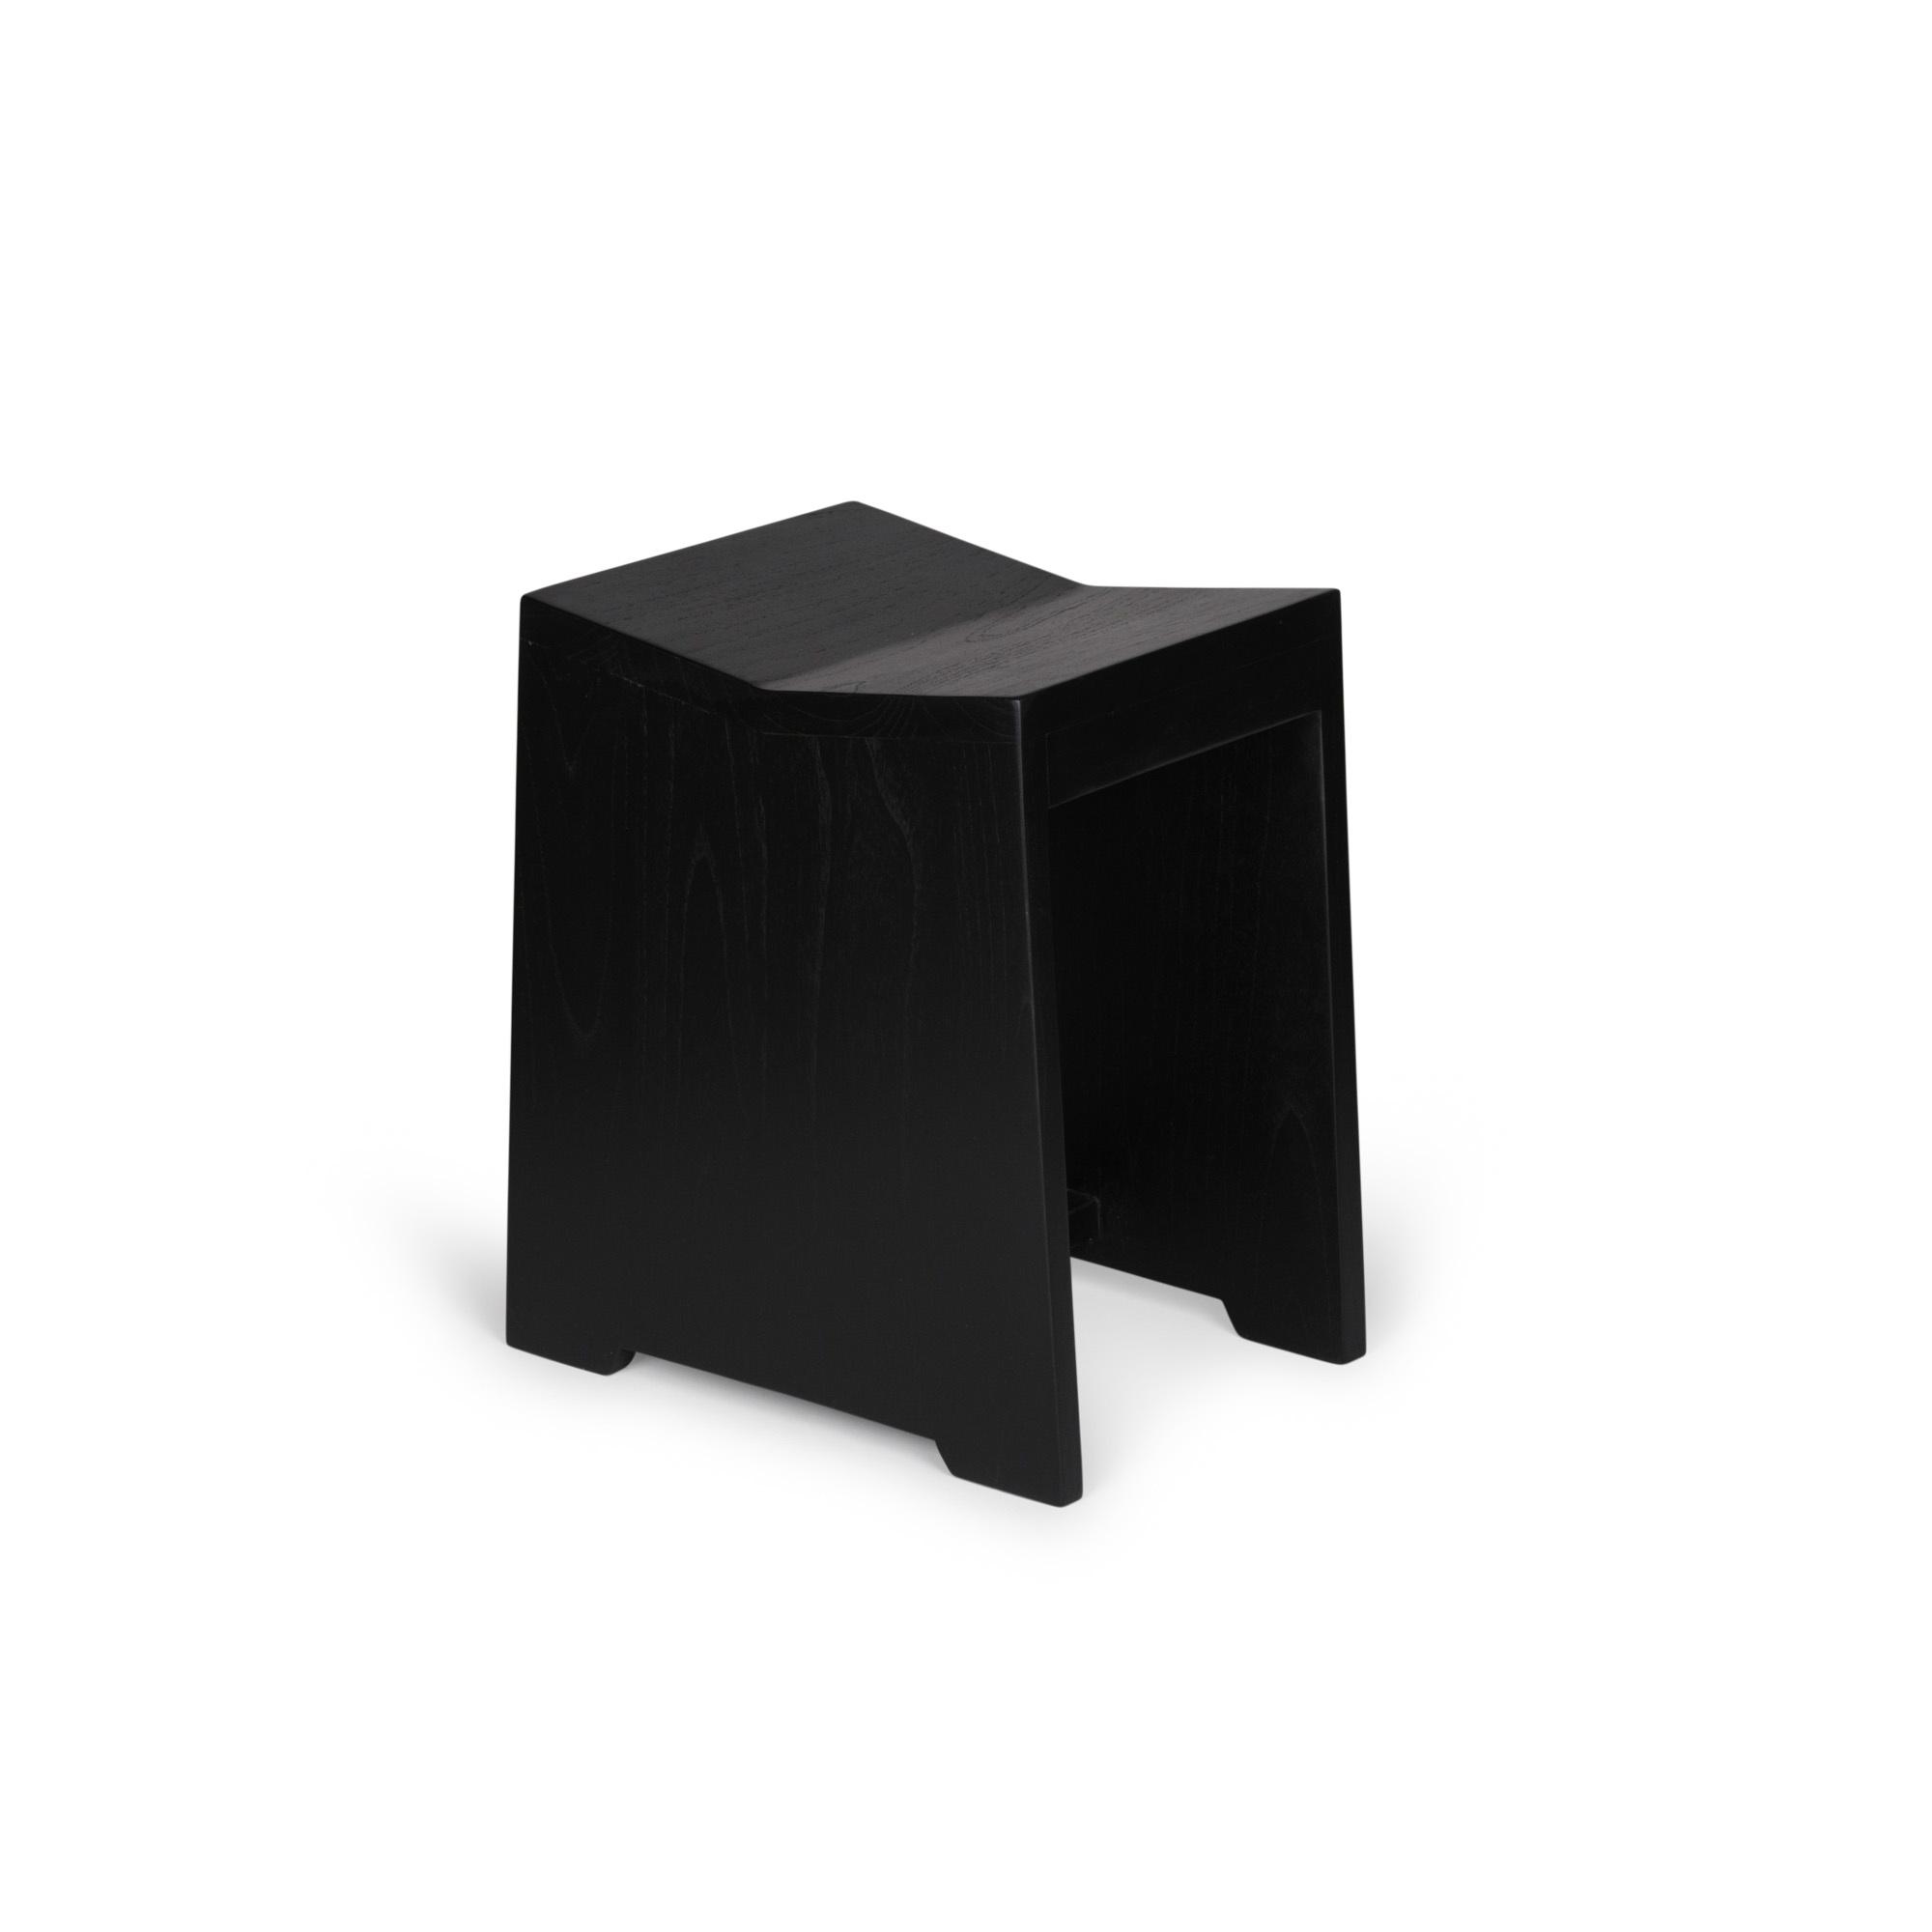 Stool / J.T.H. Flats - Chacoal Black-1